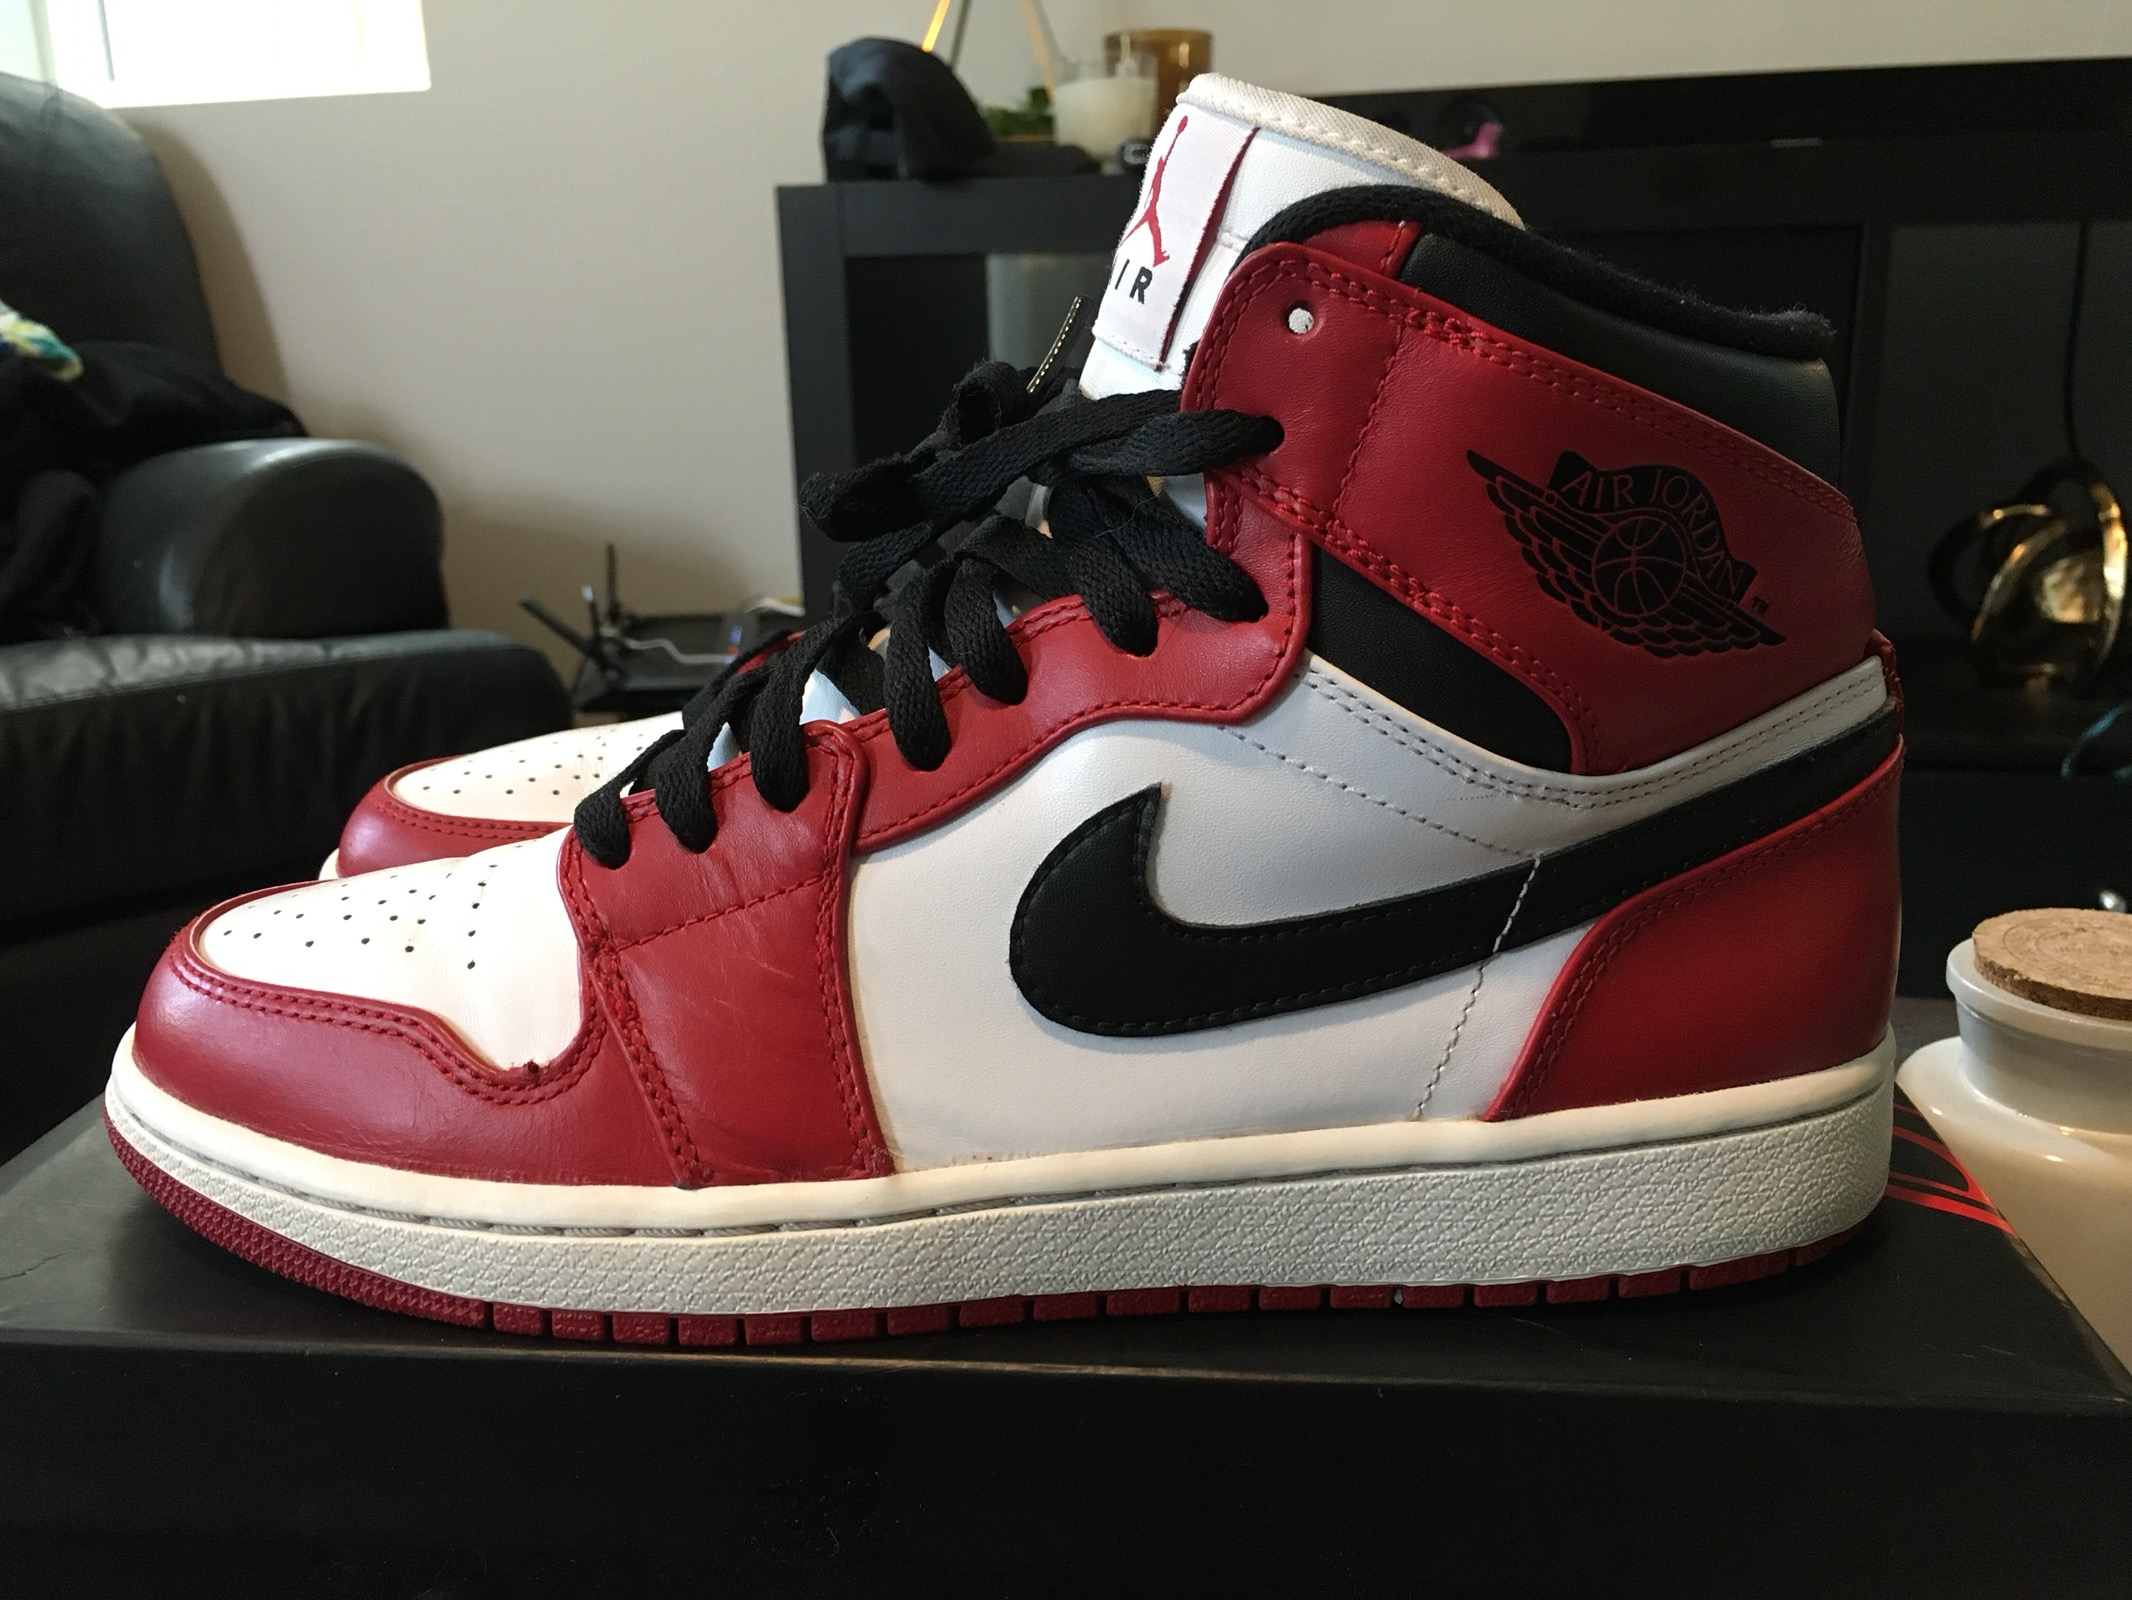 separation shoes 38fdb ea09c Air Jordan 1 Chicago 2013